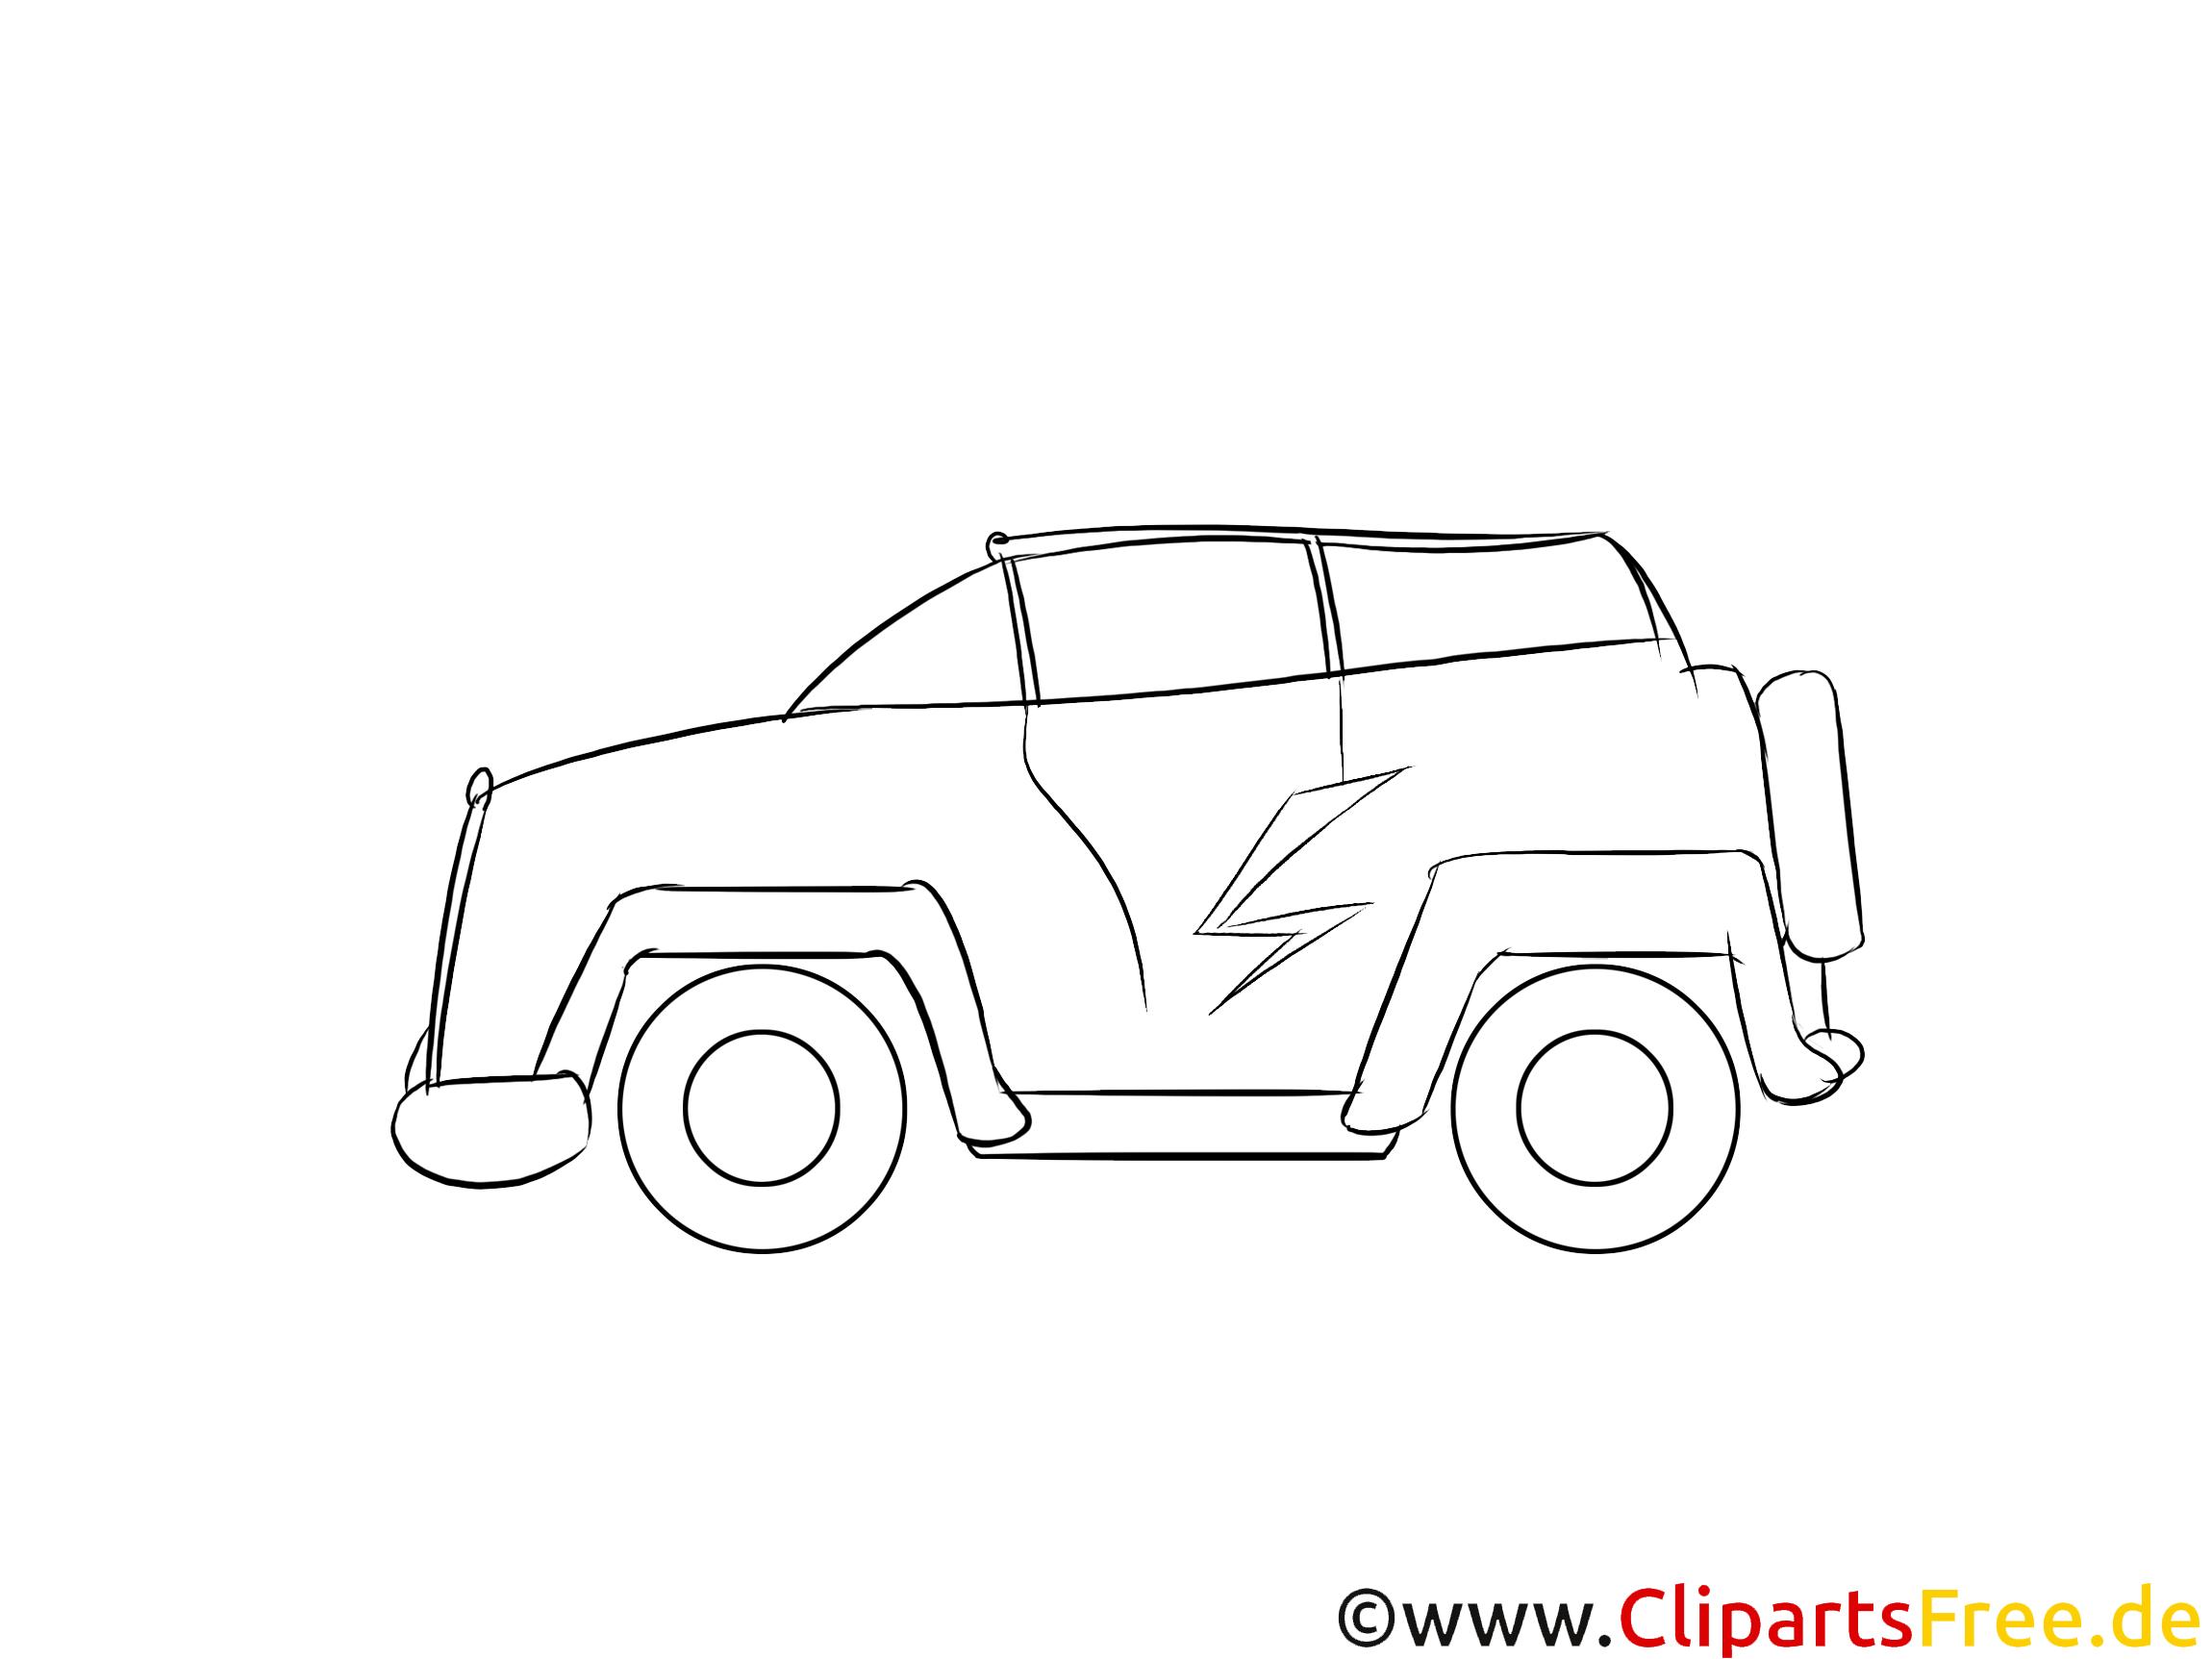 Cyber-Truck-Konzept Clipart, Bild, Grafik